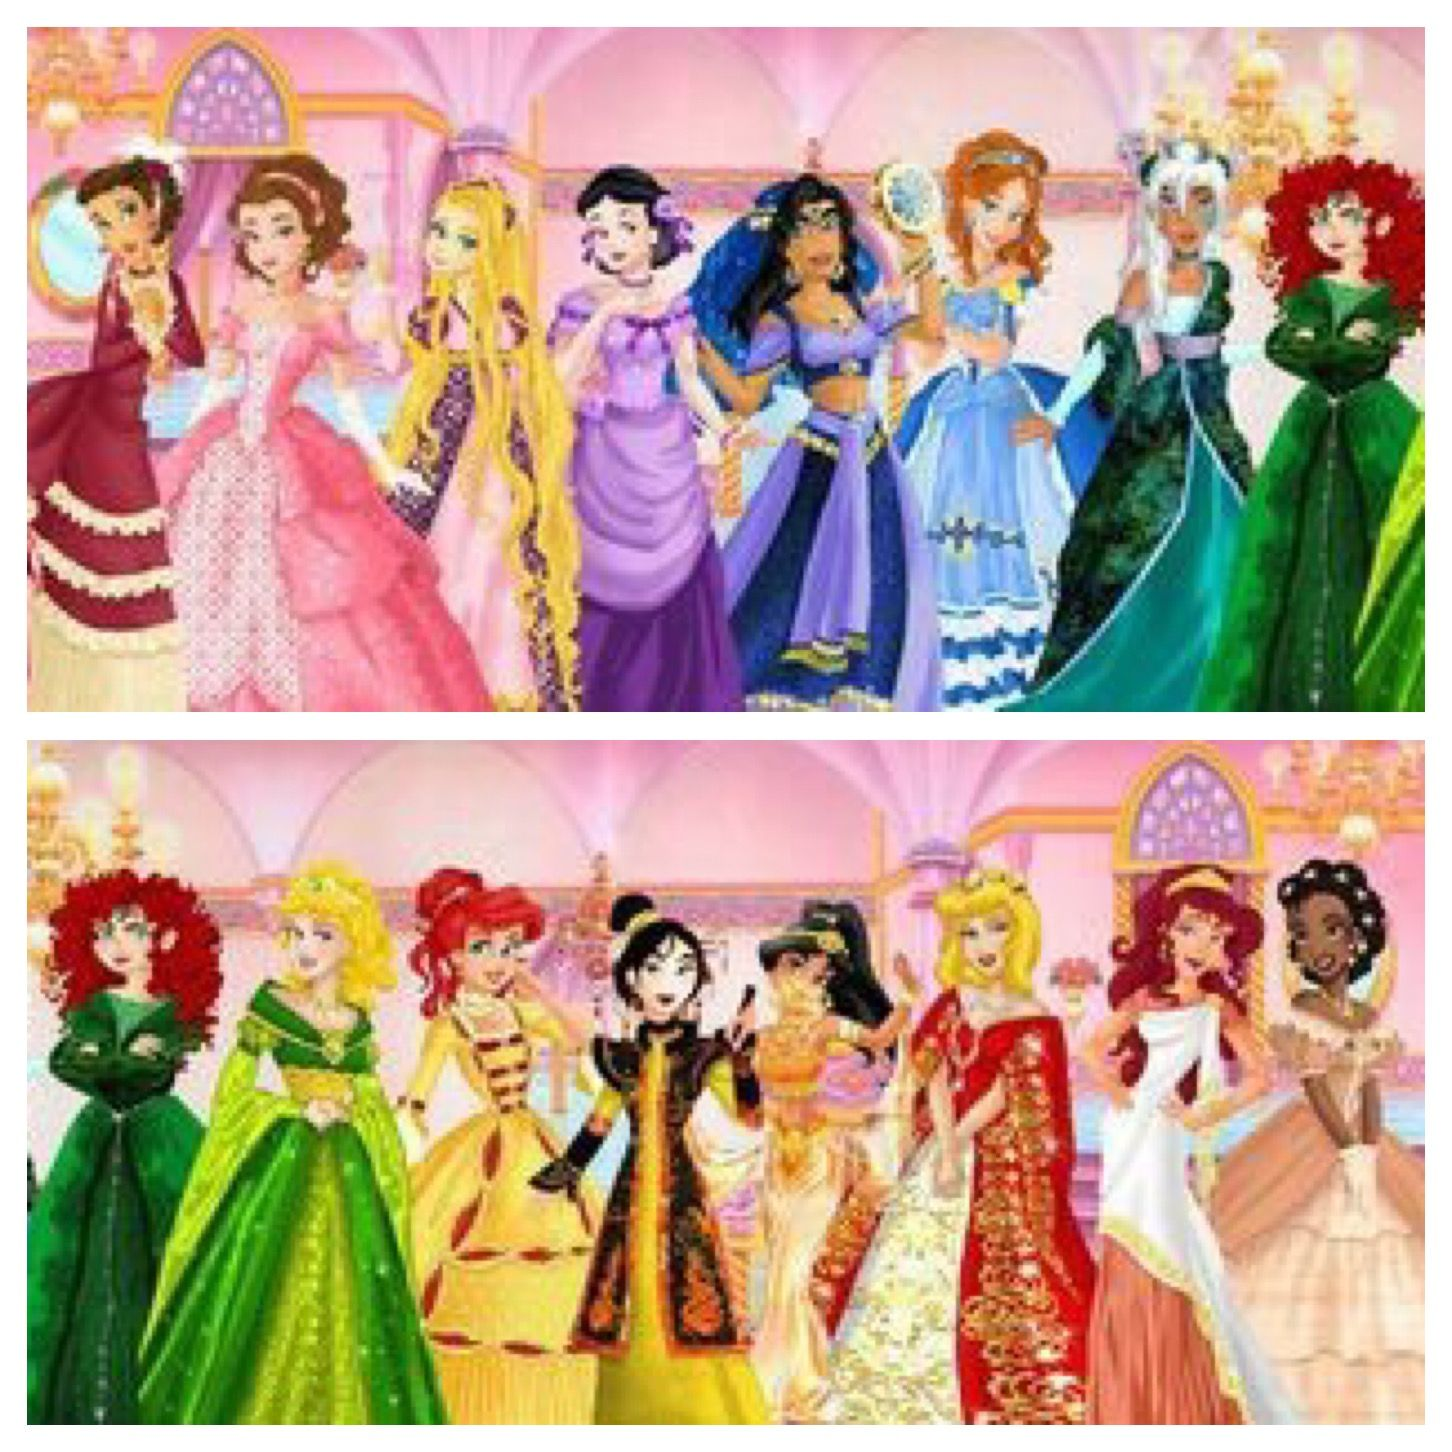 Pin De C H E R Em D I S N E Y Princesas Cosplay Pixar